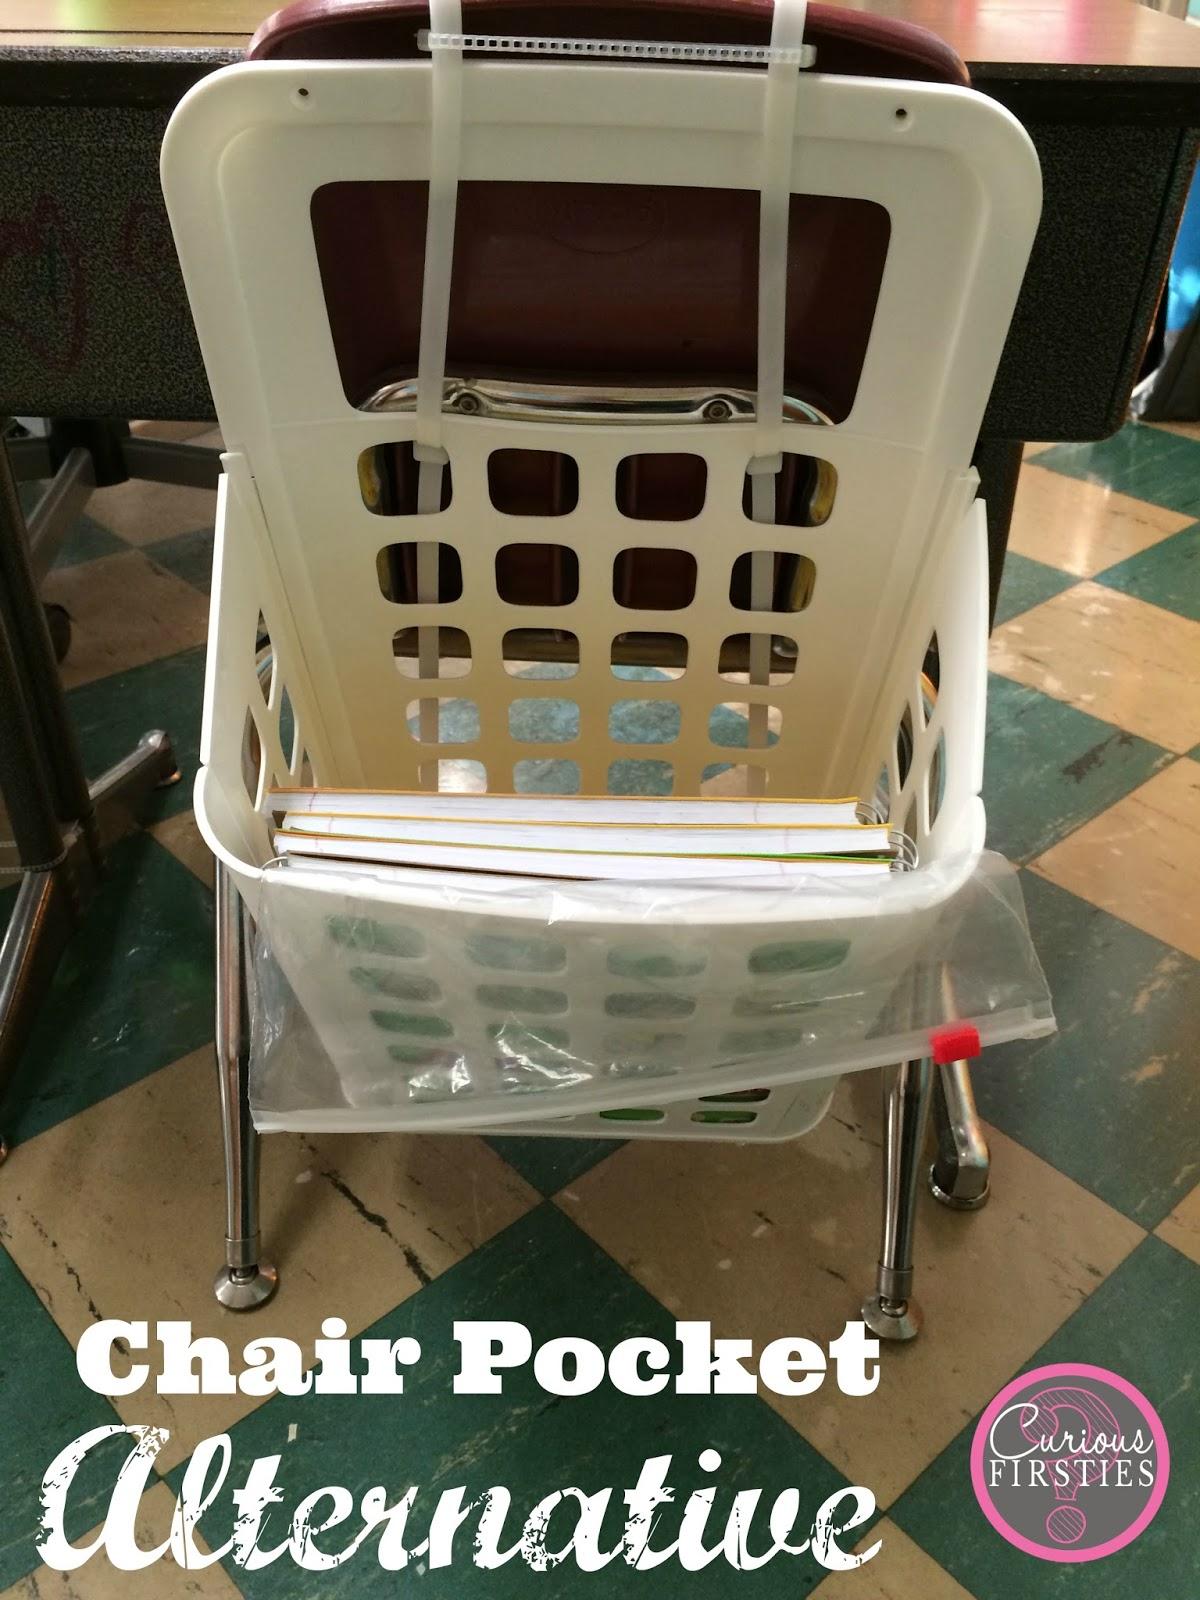 No Sew Chair Pockets Memory Foam Bed Curious Firsties Pocket Alternative